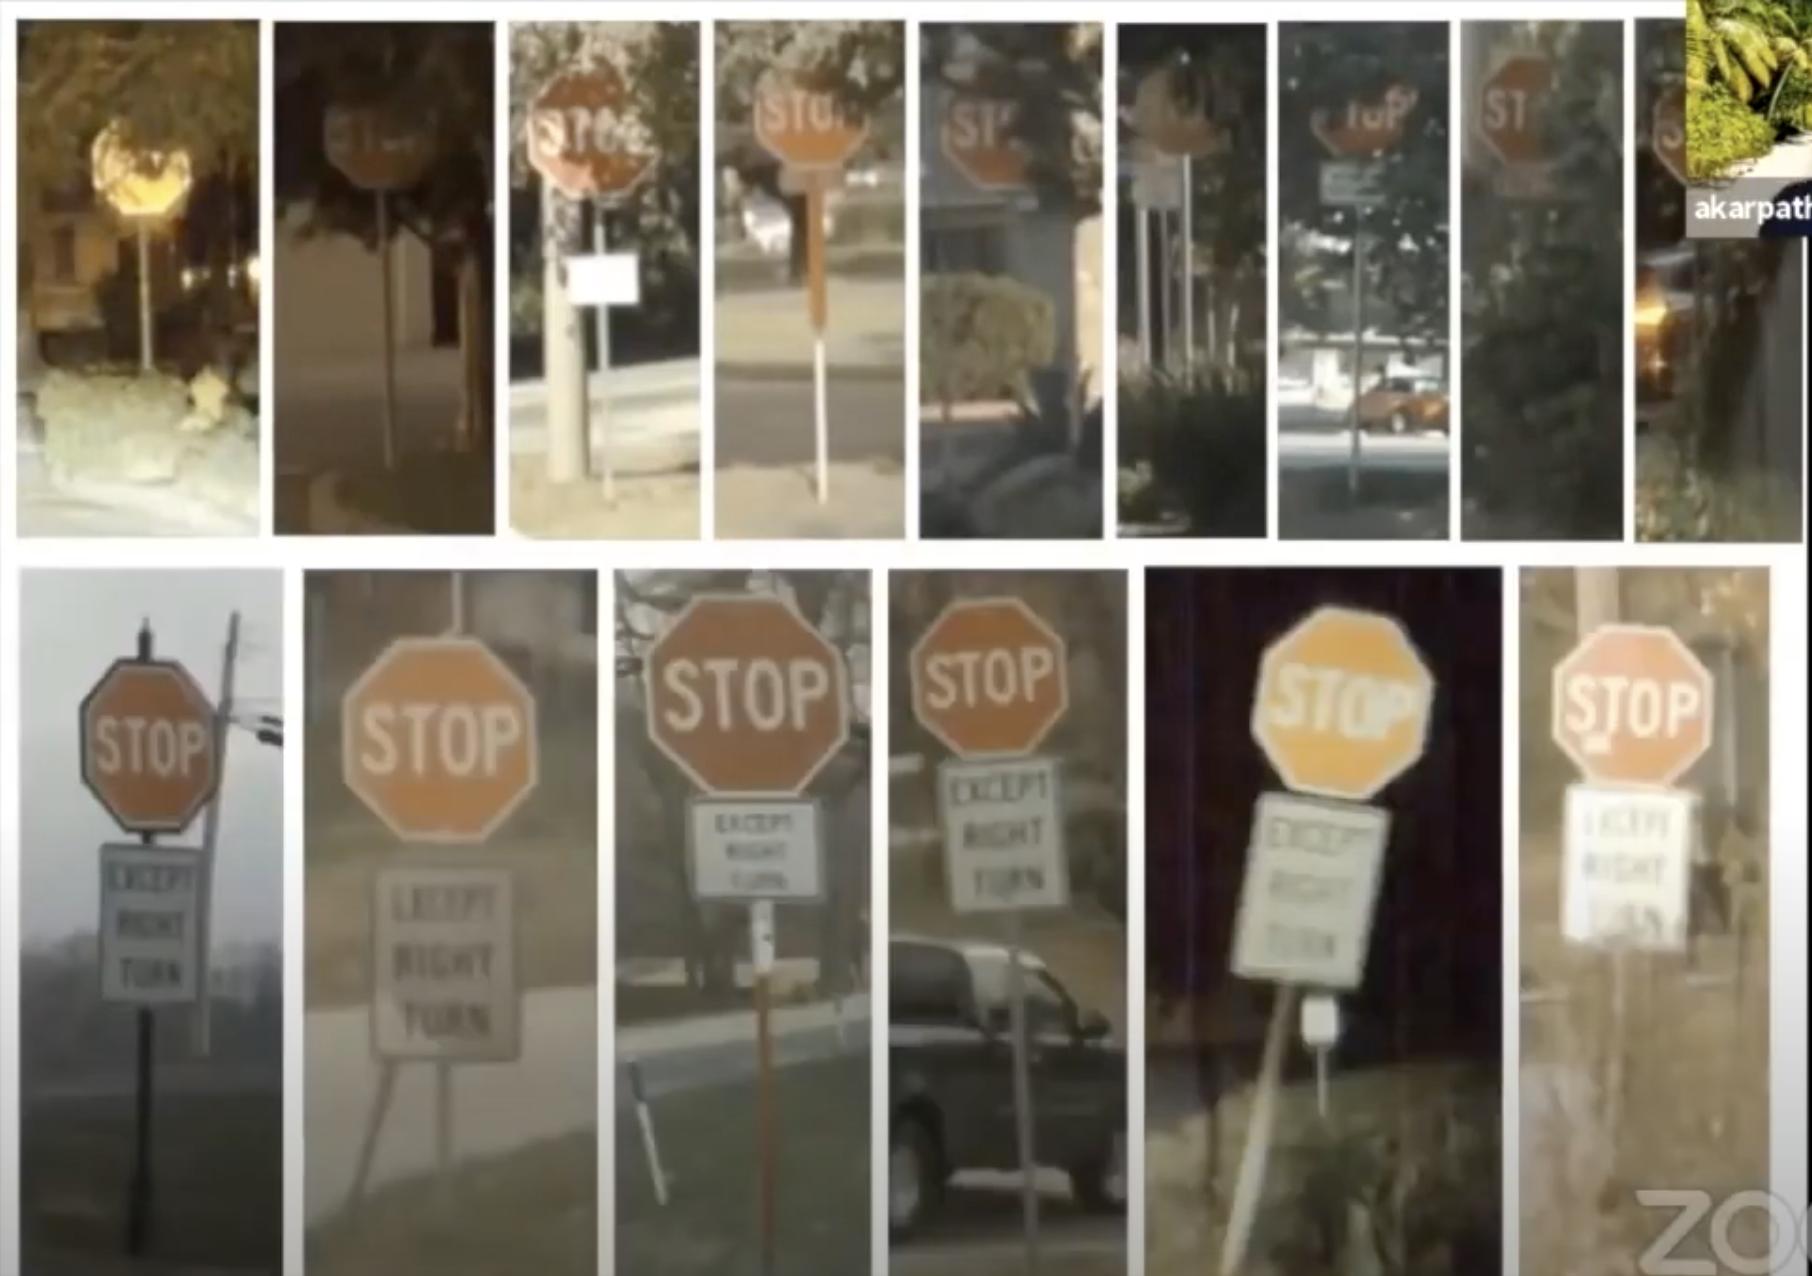 Tesla's stop signs dataset